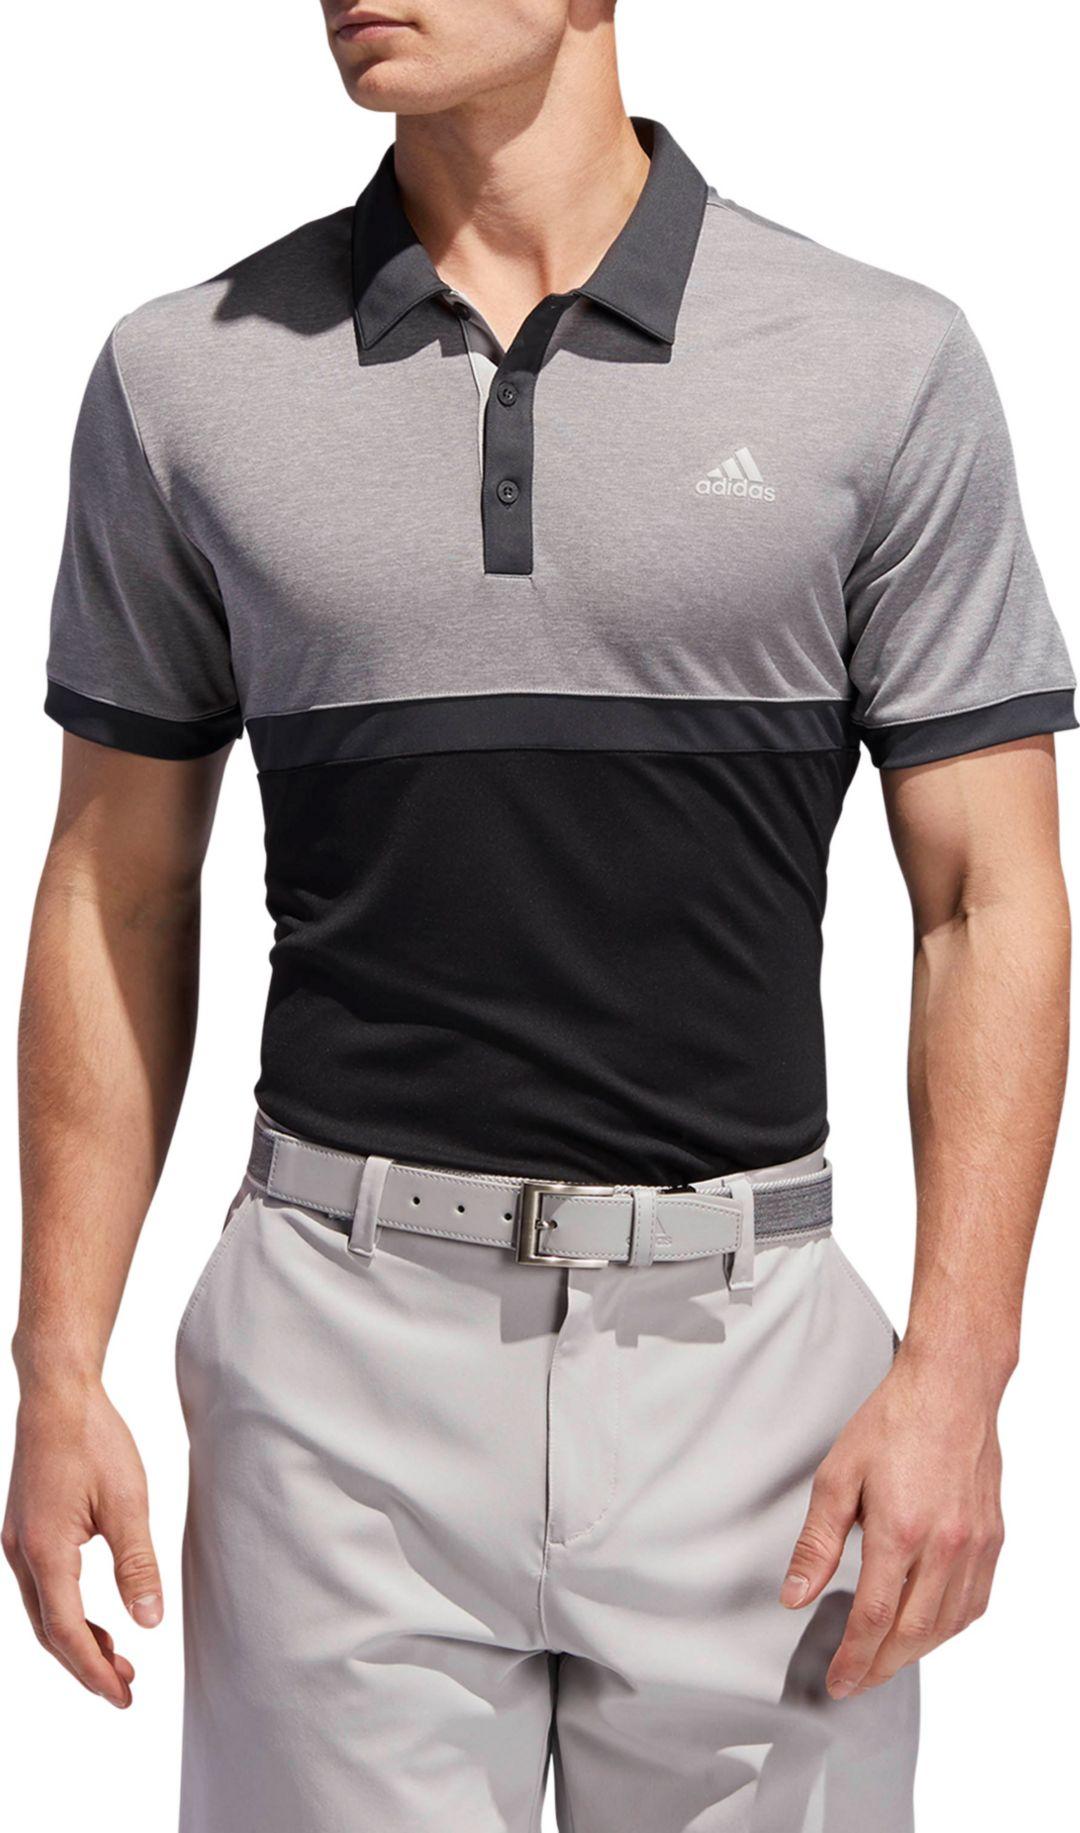 5762d2bca68a5 adidas Men's Drive Heather Colorblock Golf Polo